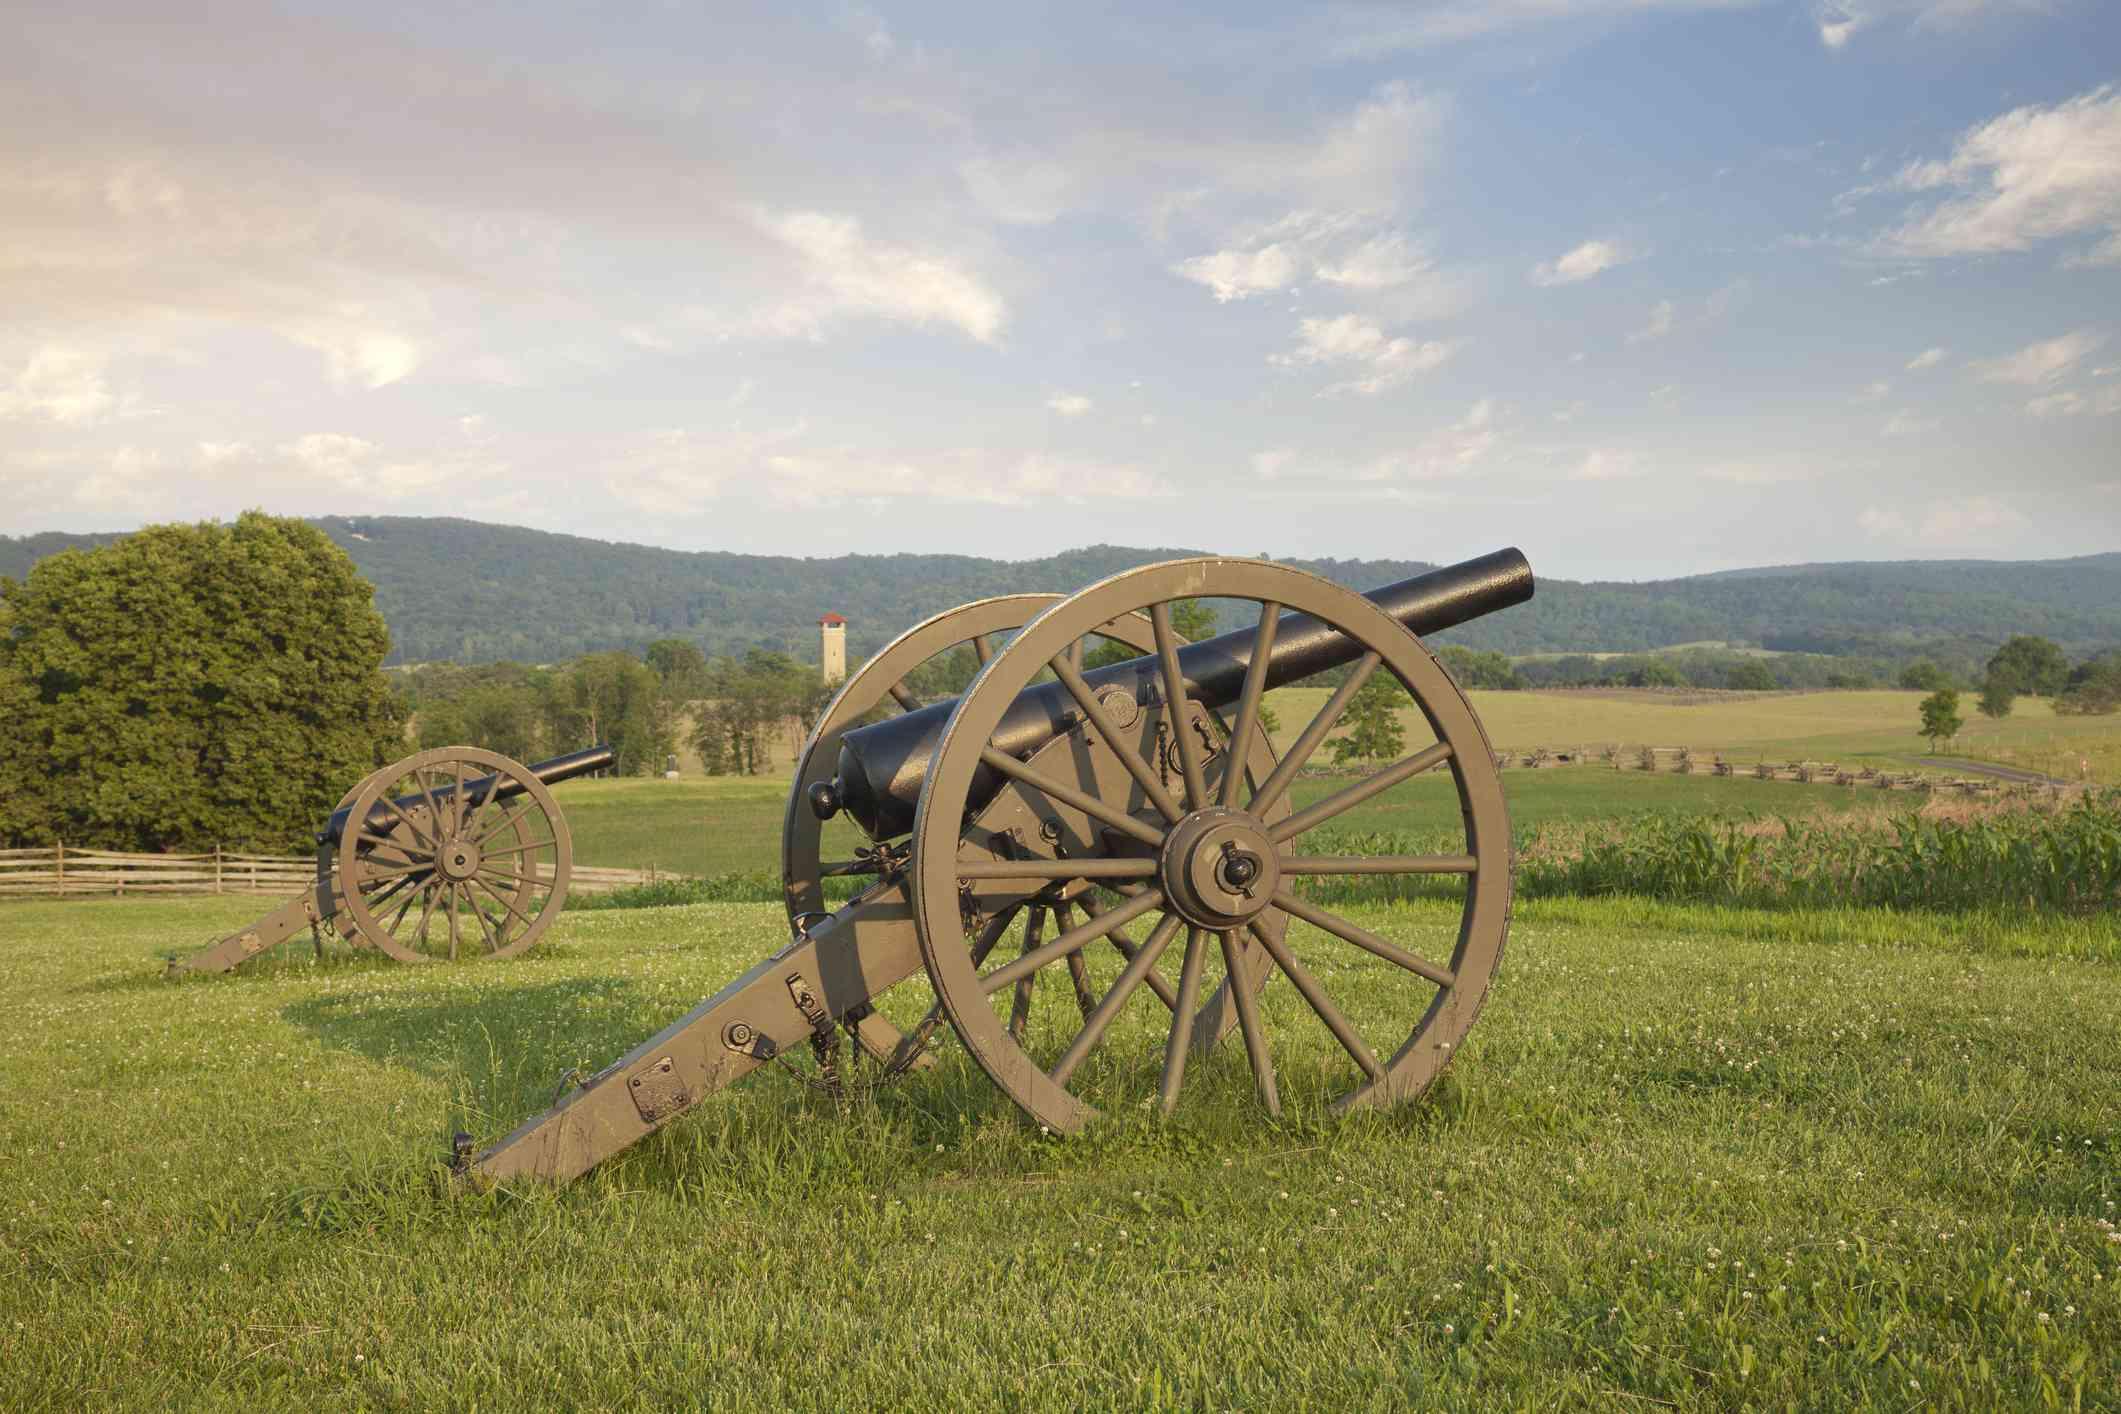 Cannons at Antietam (Sharpsburg) Battlefield